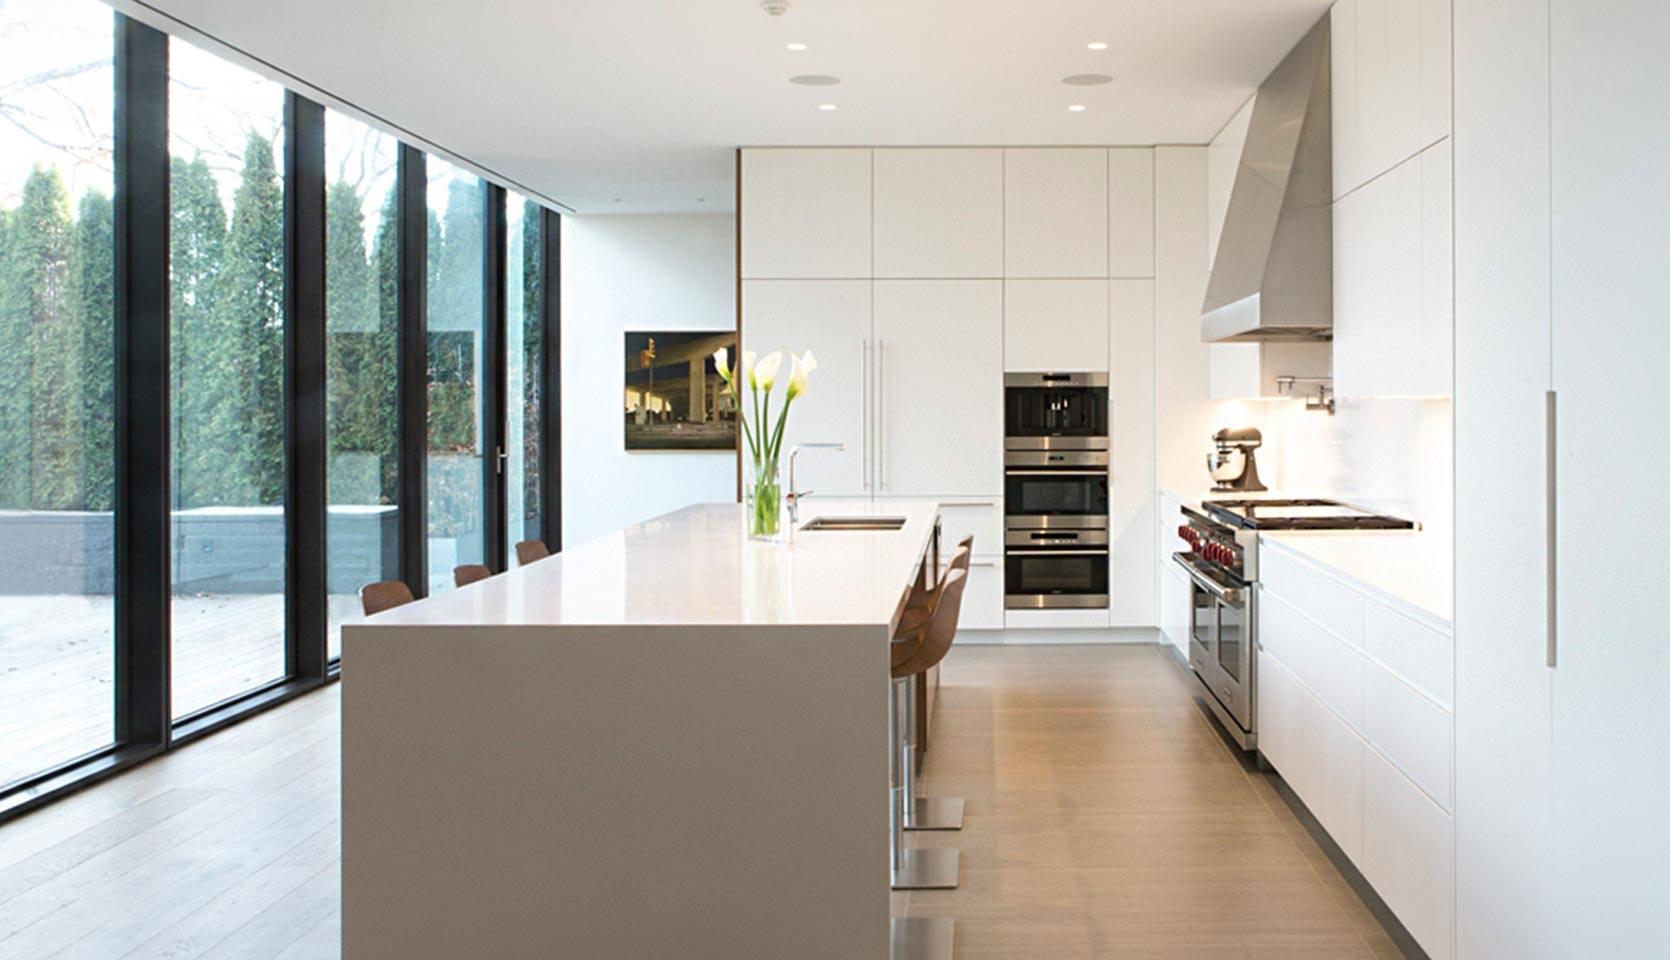 severnwoods-modern-rosedale-house-kitchen-with-white-aesthetic